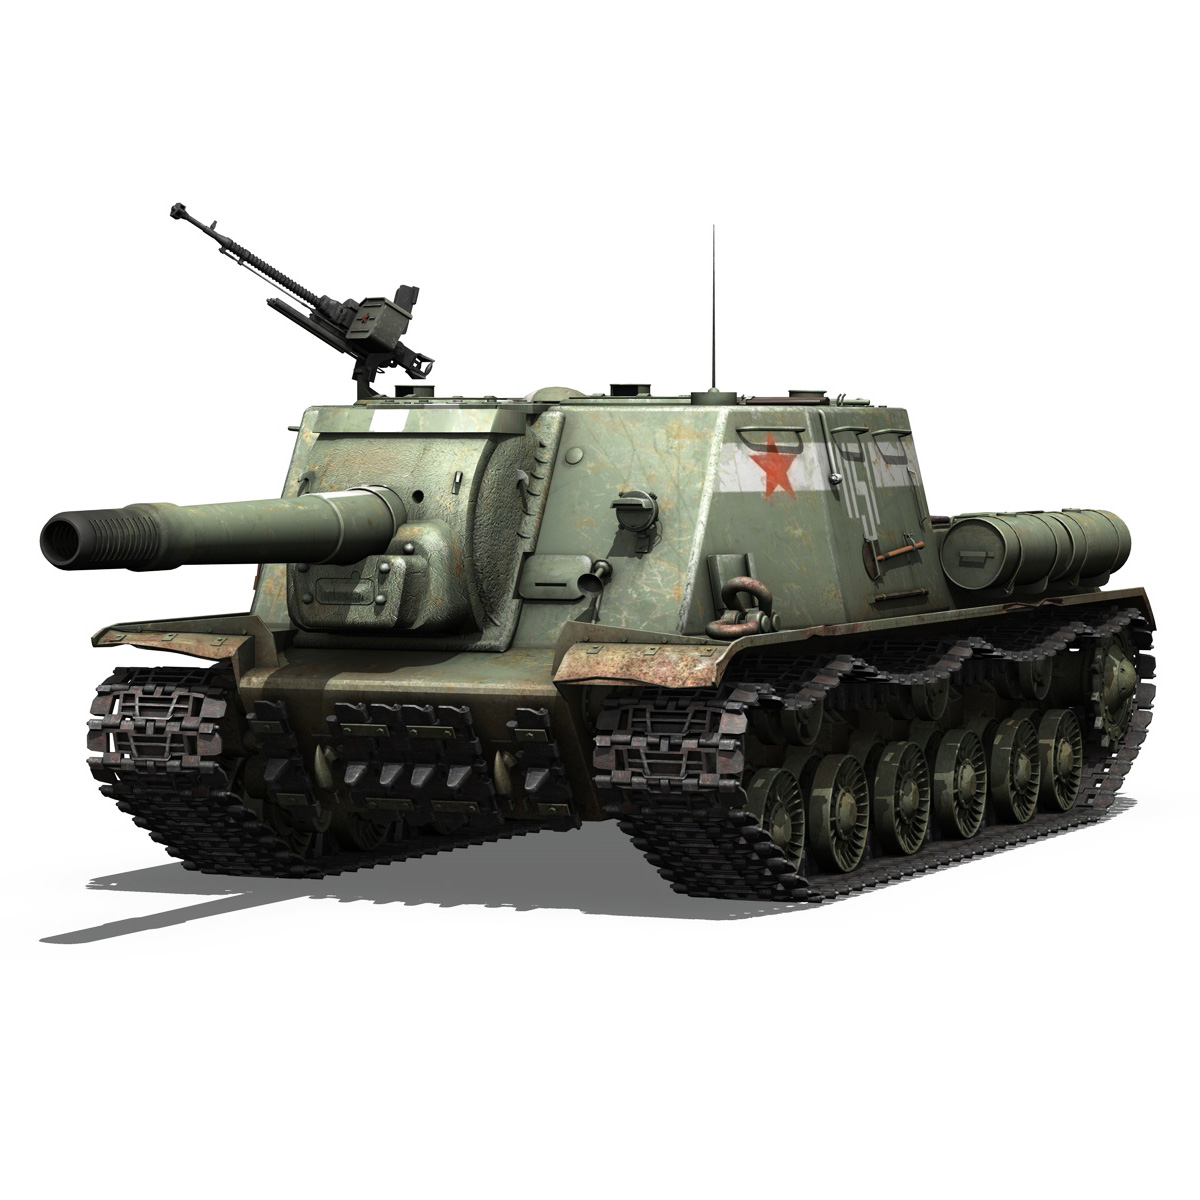 isu 152 soviet heavy self propelled gun 3d model 3ds fbx c4d lwo obj 187526